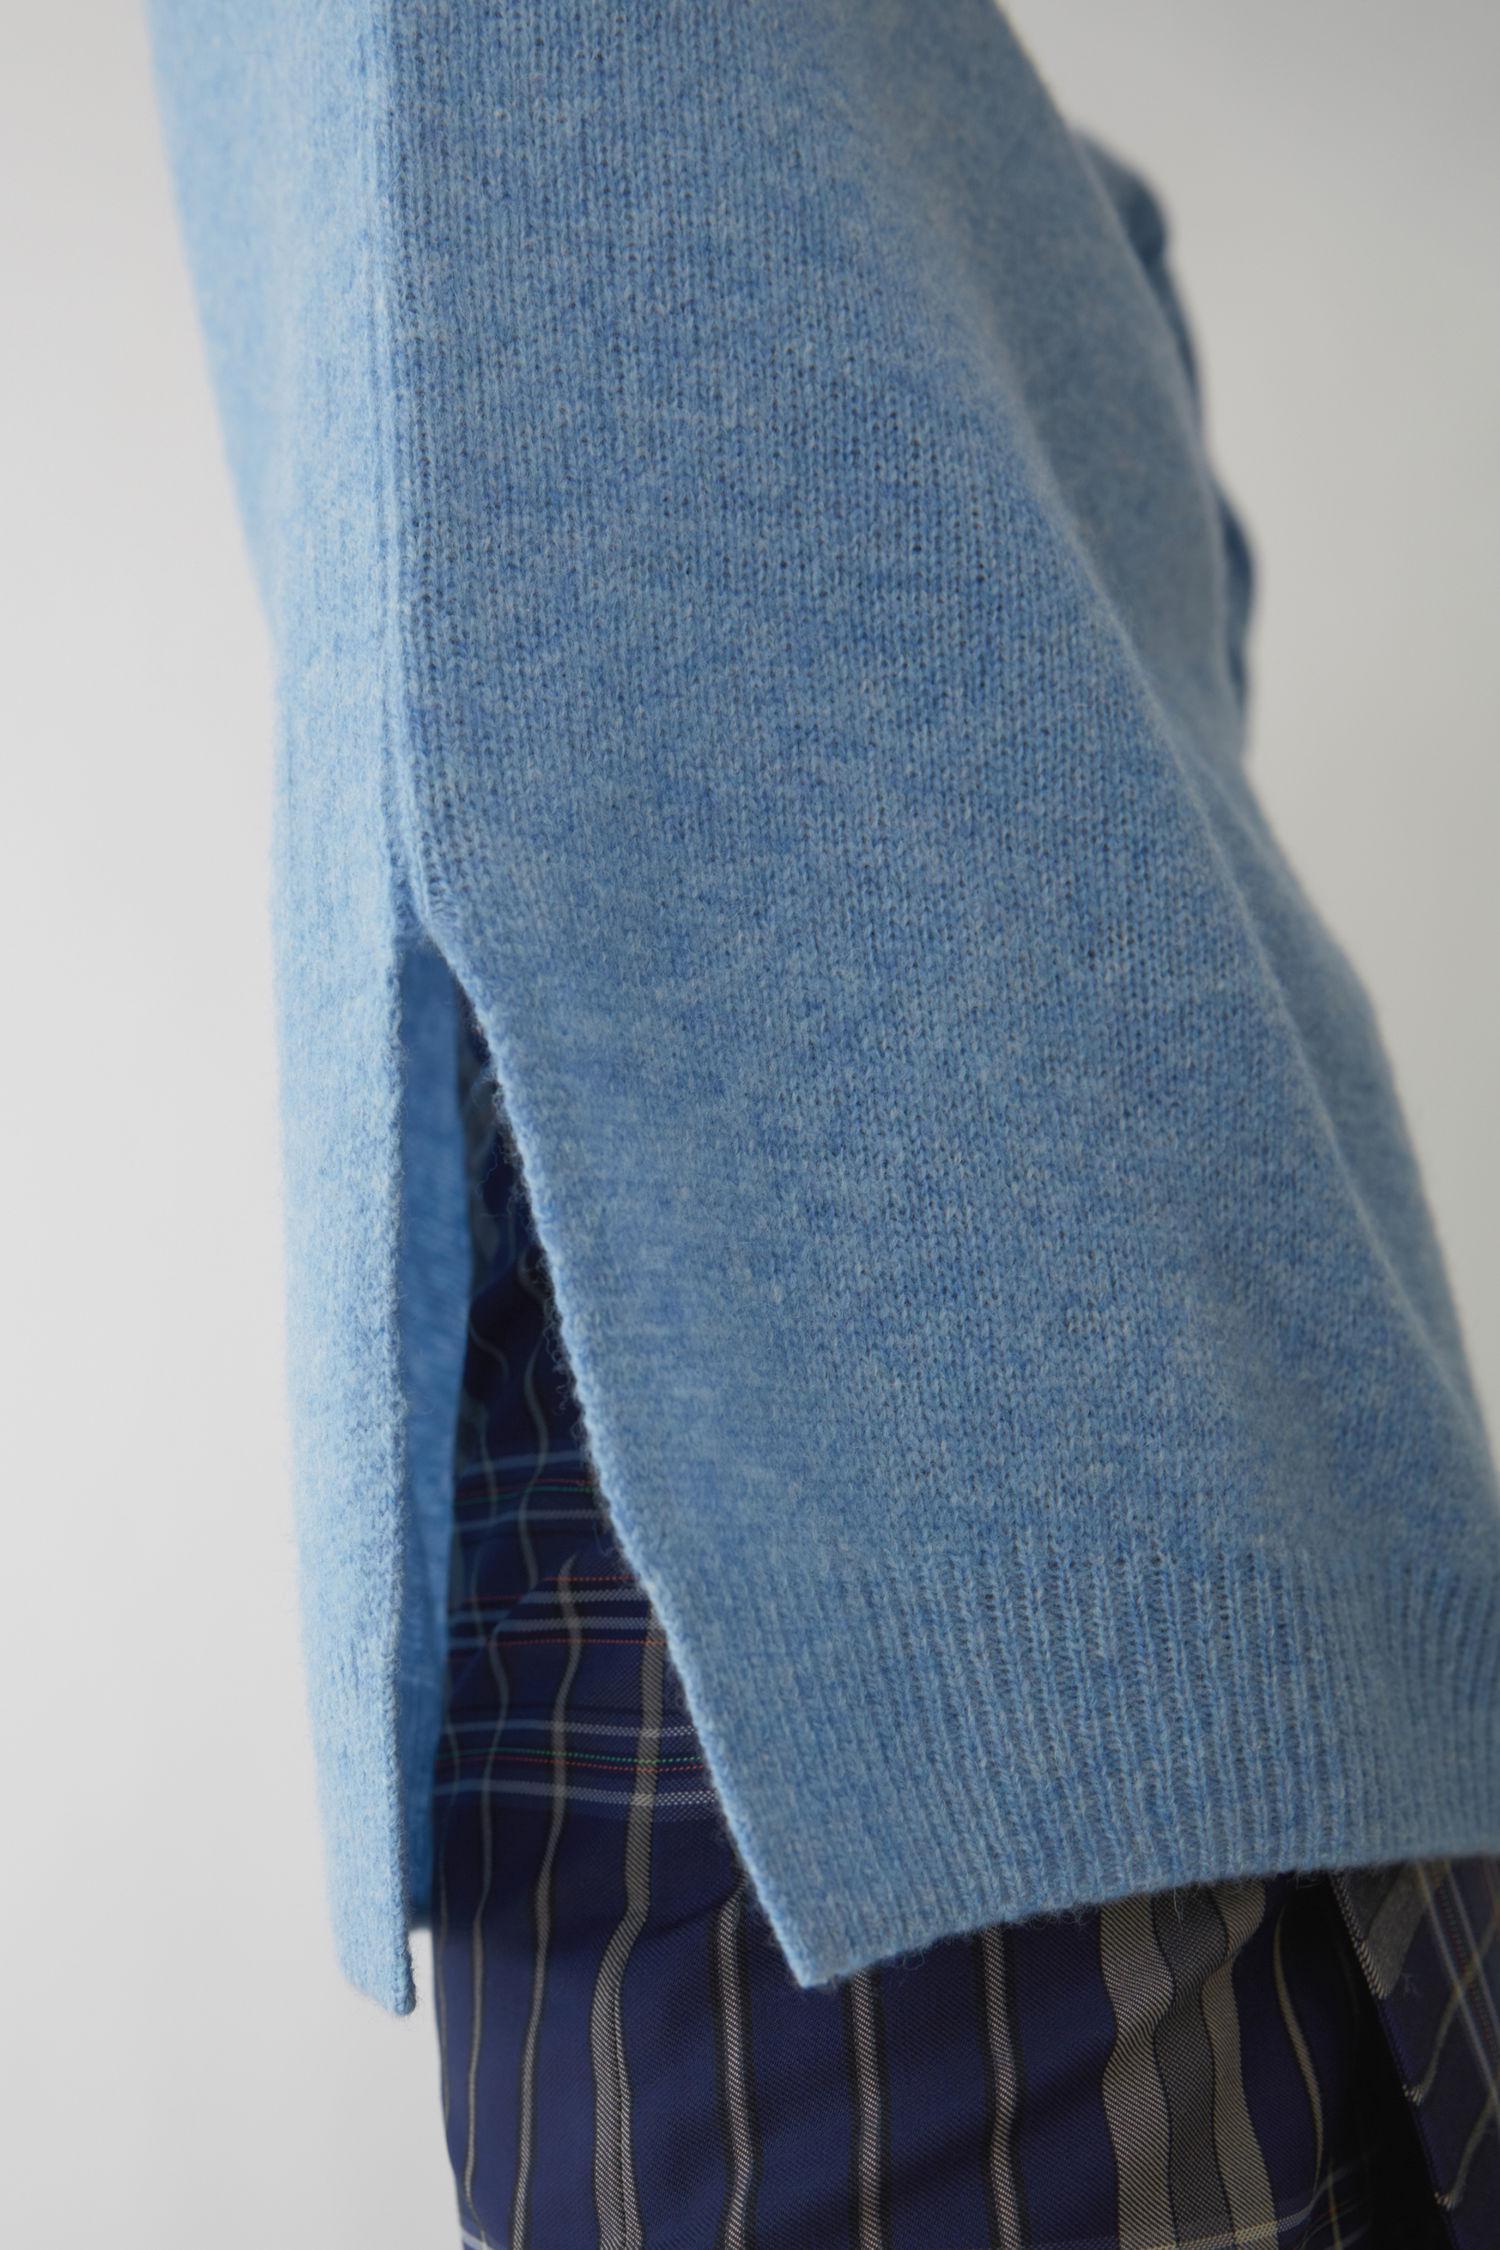 bb1e58a6 Acne Studios Loose Fit Sweater light Blue Melange in Blue - Lyst